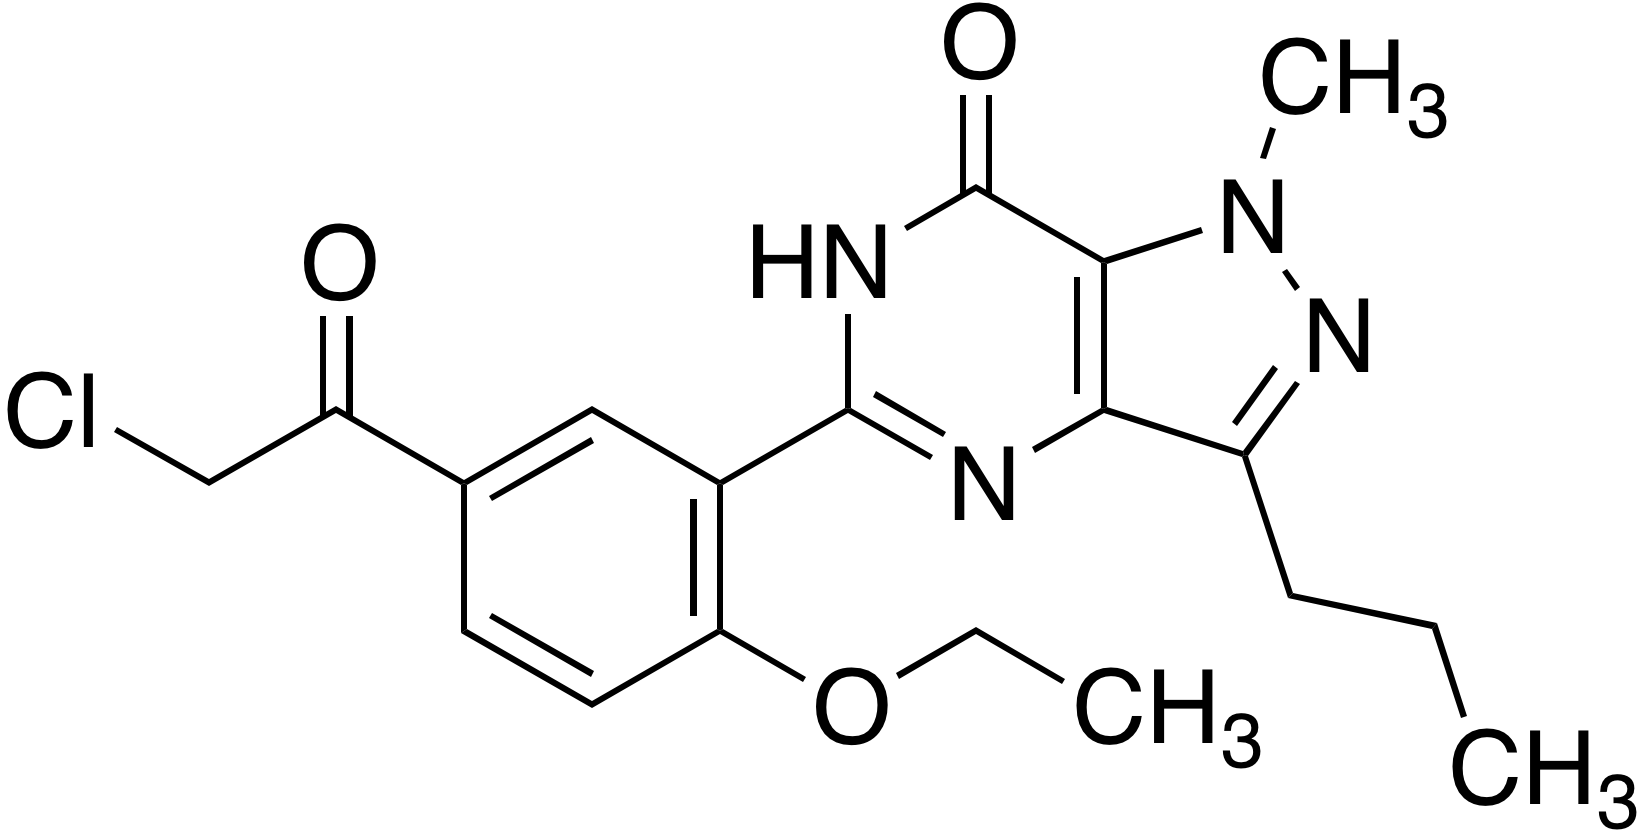 Chlorodenafil